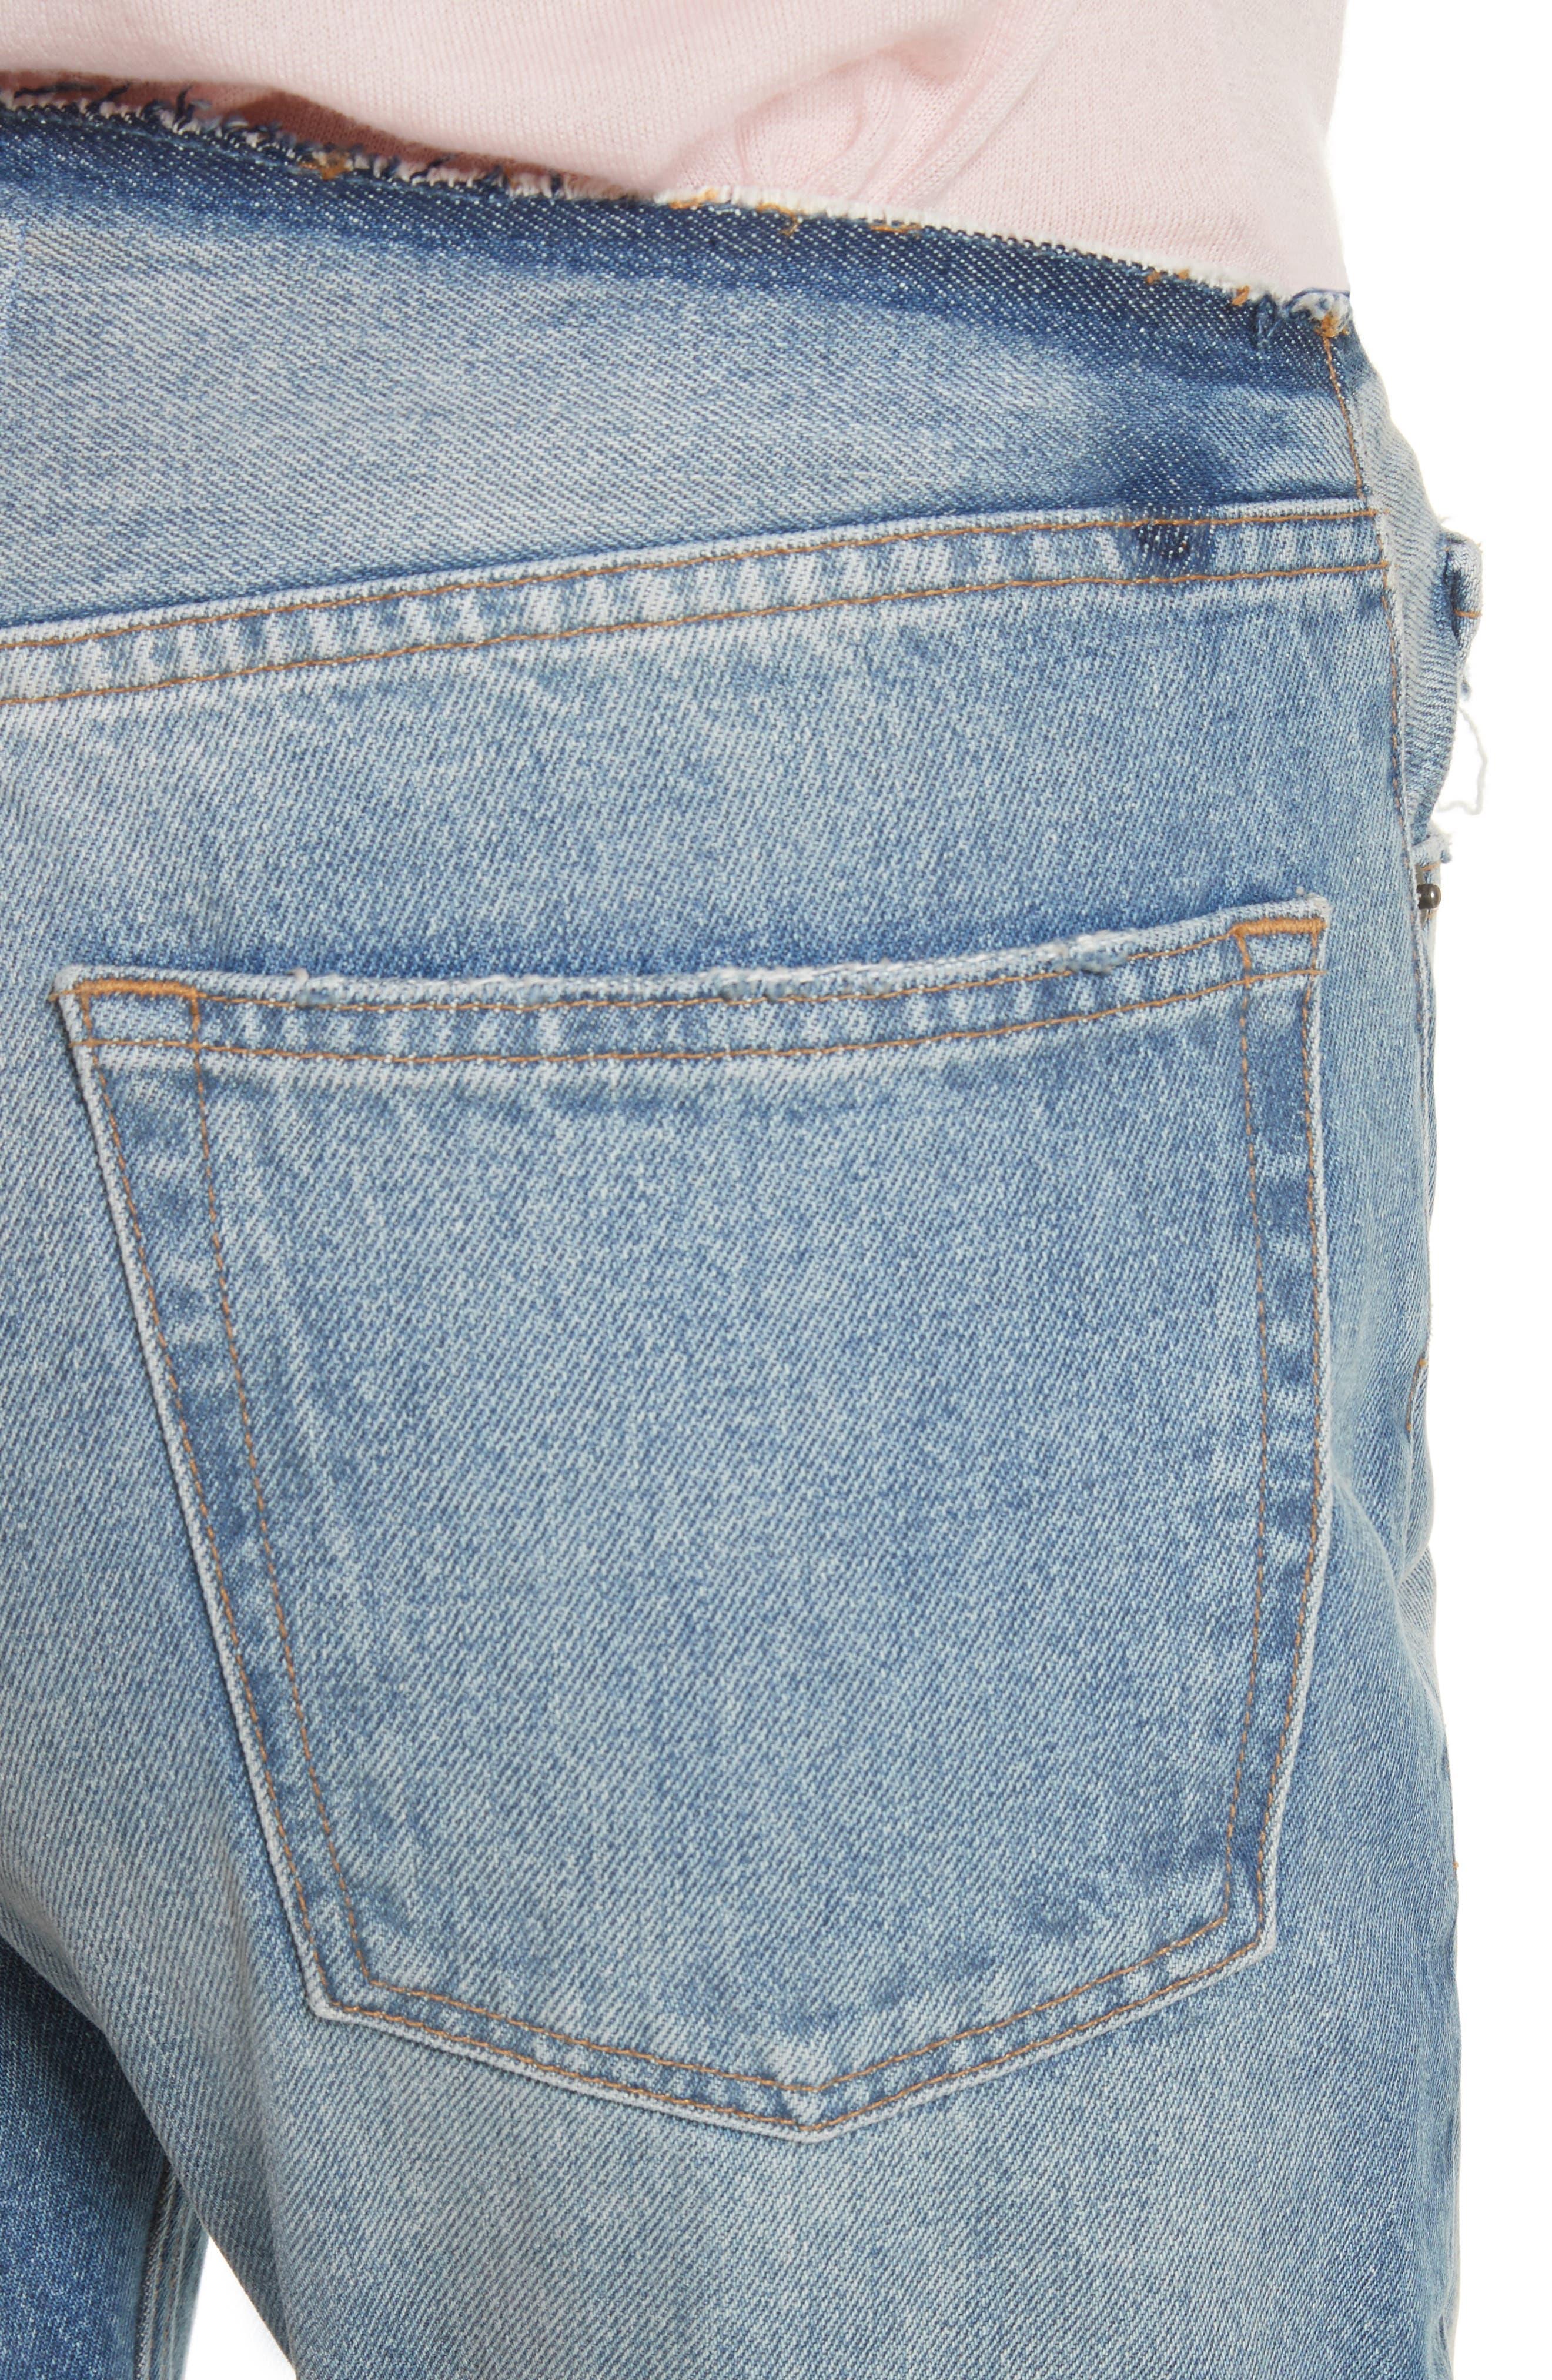 Re-Release Le Original Raw Edge High Waist Jeans,                             Alternate thumbnail 4, color,                             Horne